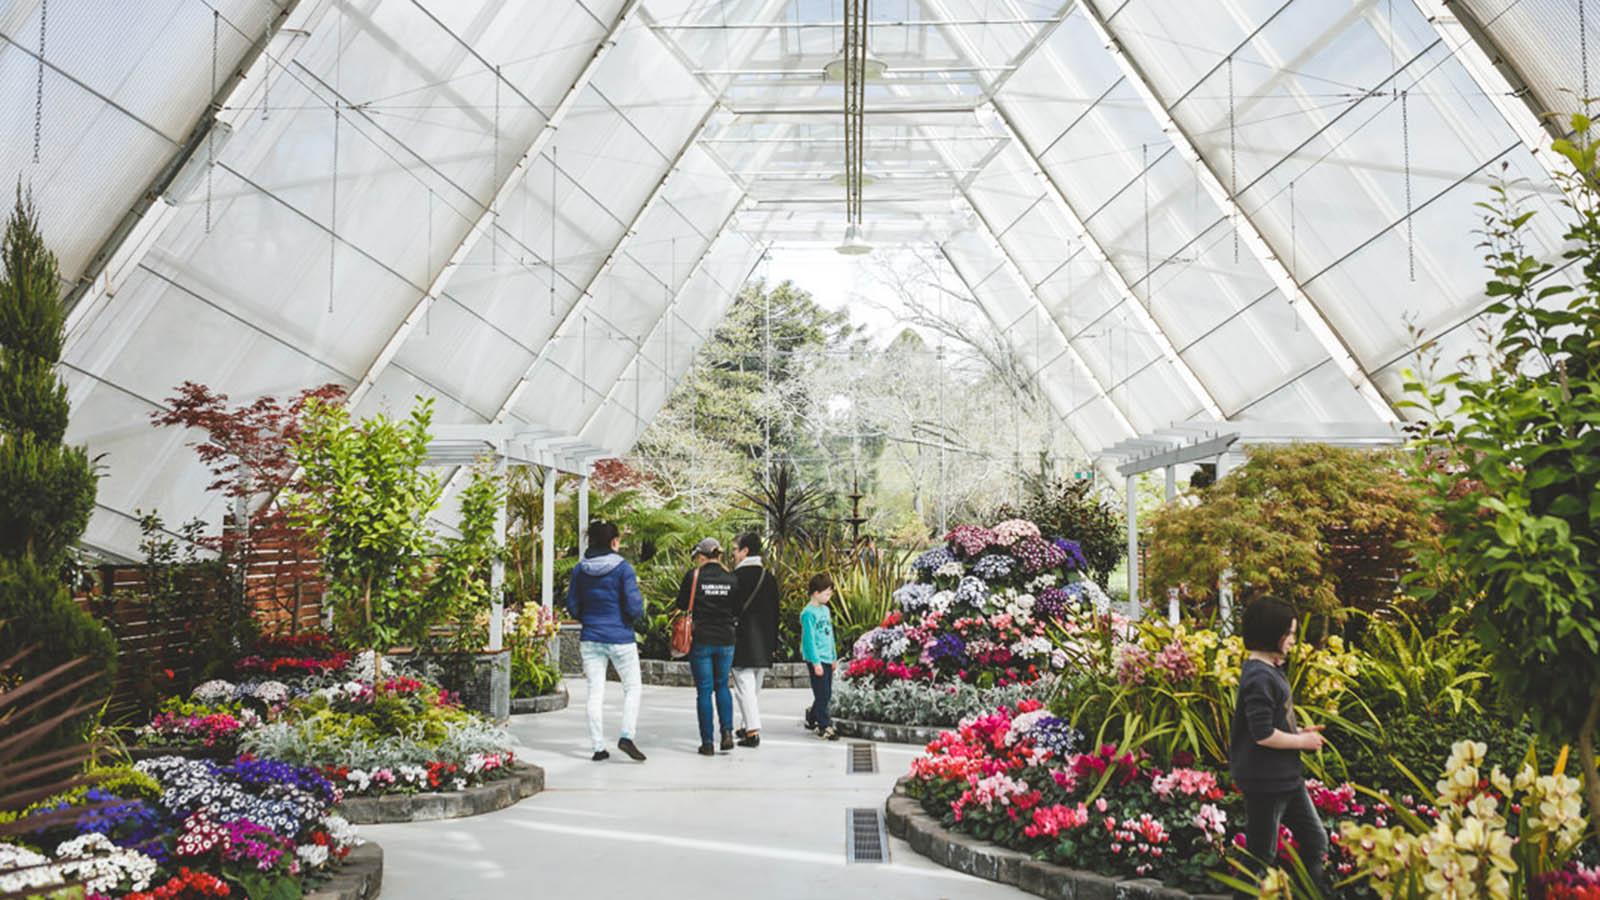 Ballarat Botanical Gardens, Goldfields, Victoria, Australia. Credit: Anthony Evans